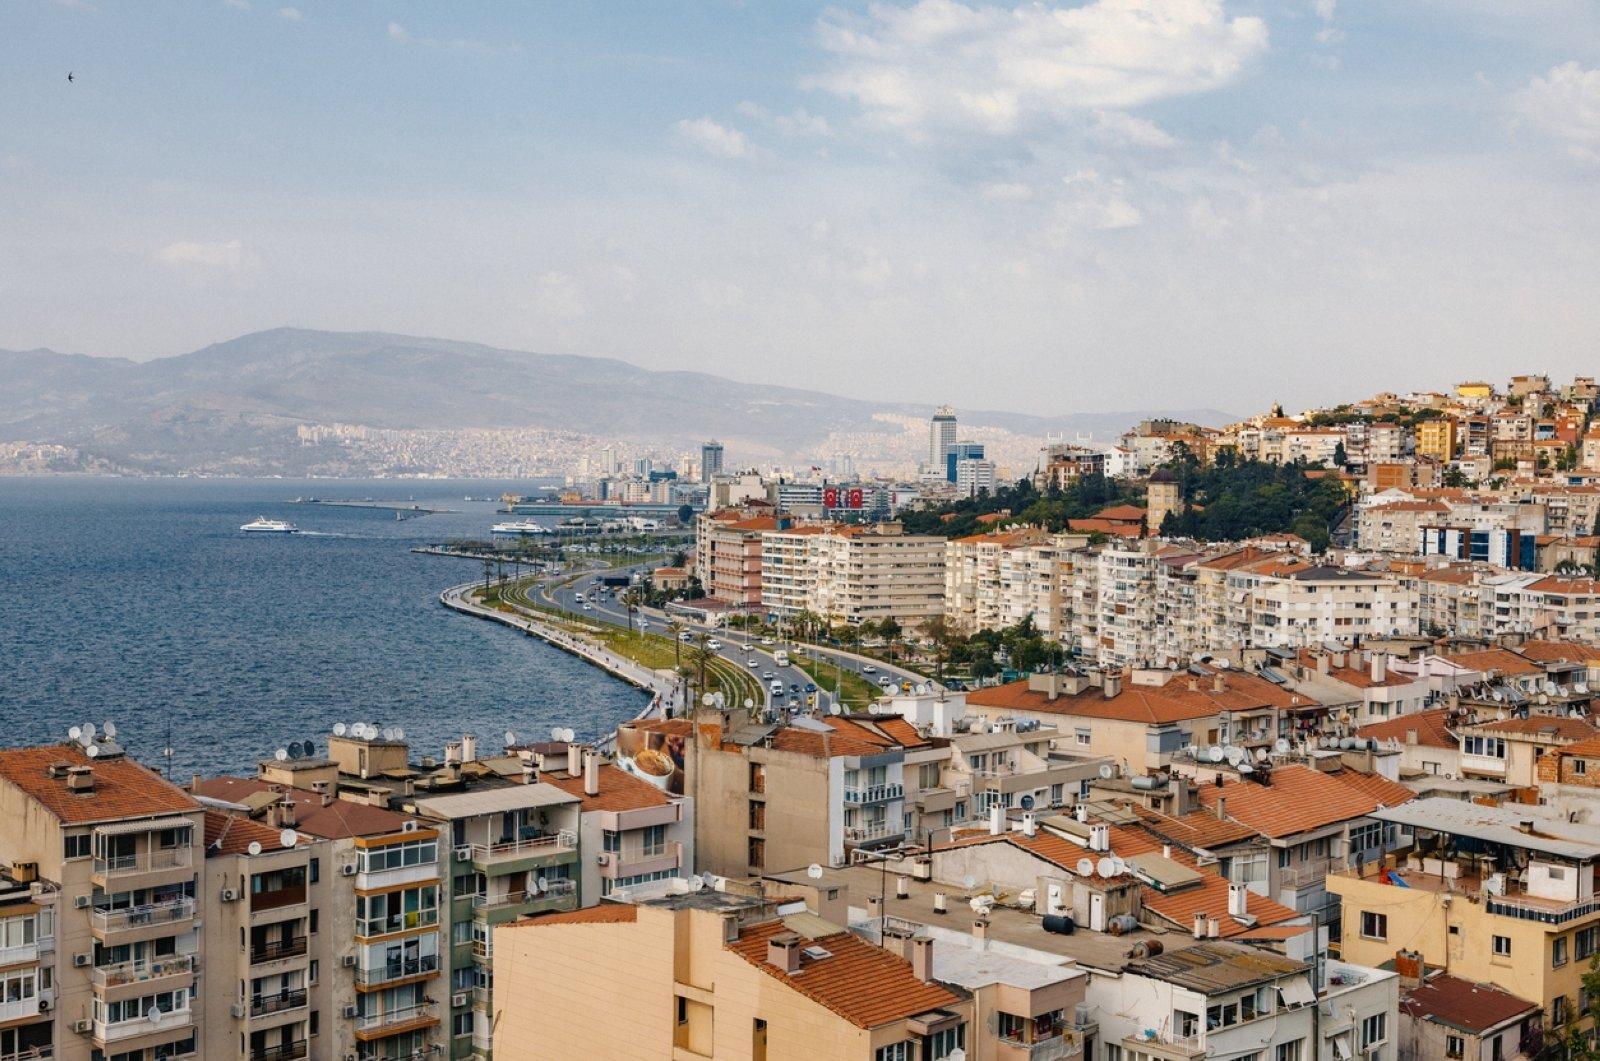 Mavişehir, Karşıyaka and Narlıdere districts in the city of Izmir are the most preferred spots by Iranian investors. (iStock Photo)